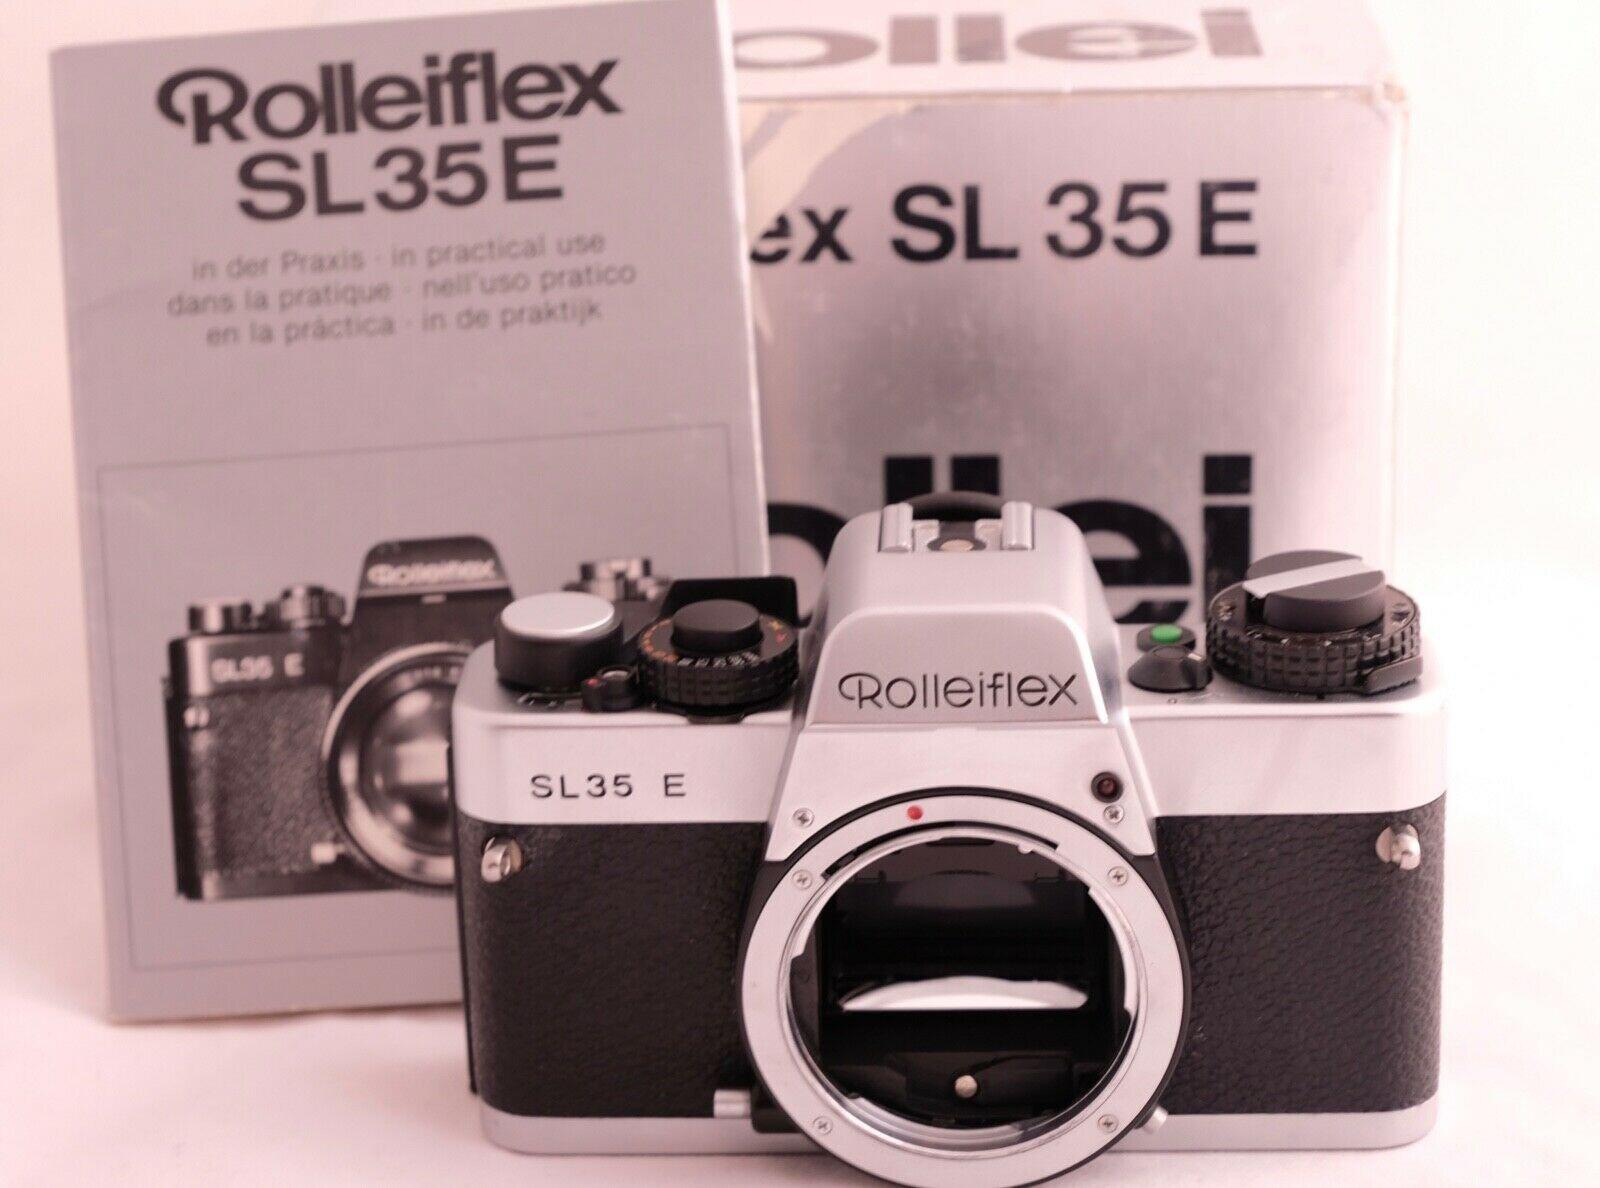 Rolleiflex SL35 E from the eBay listing.